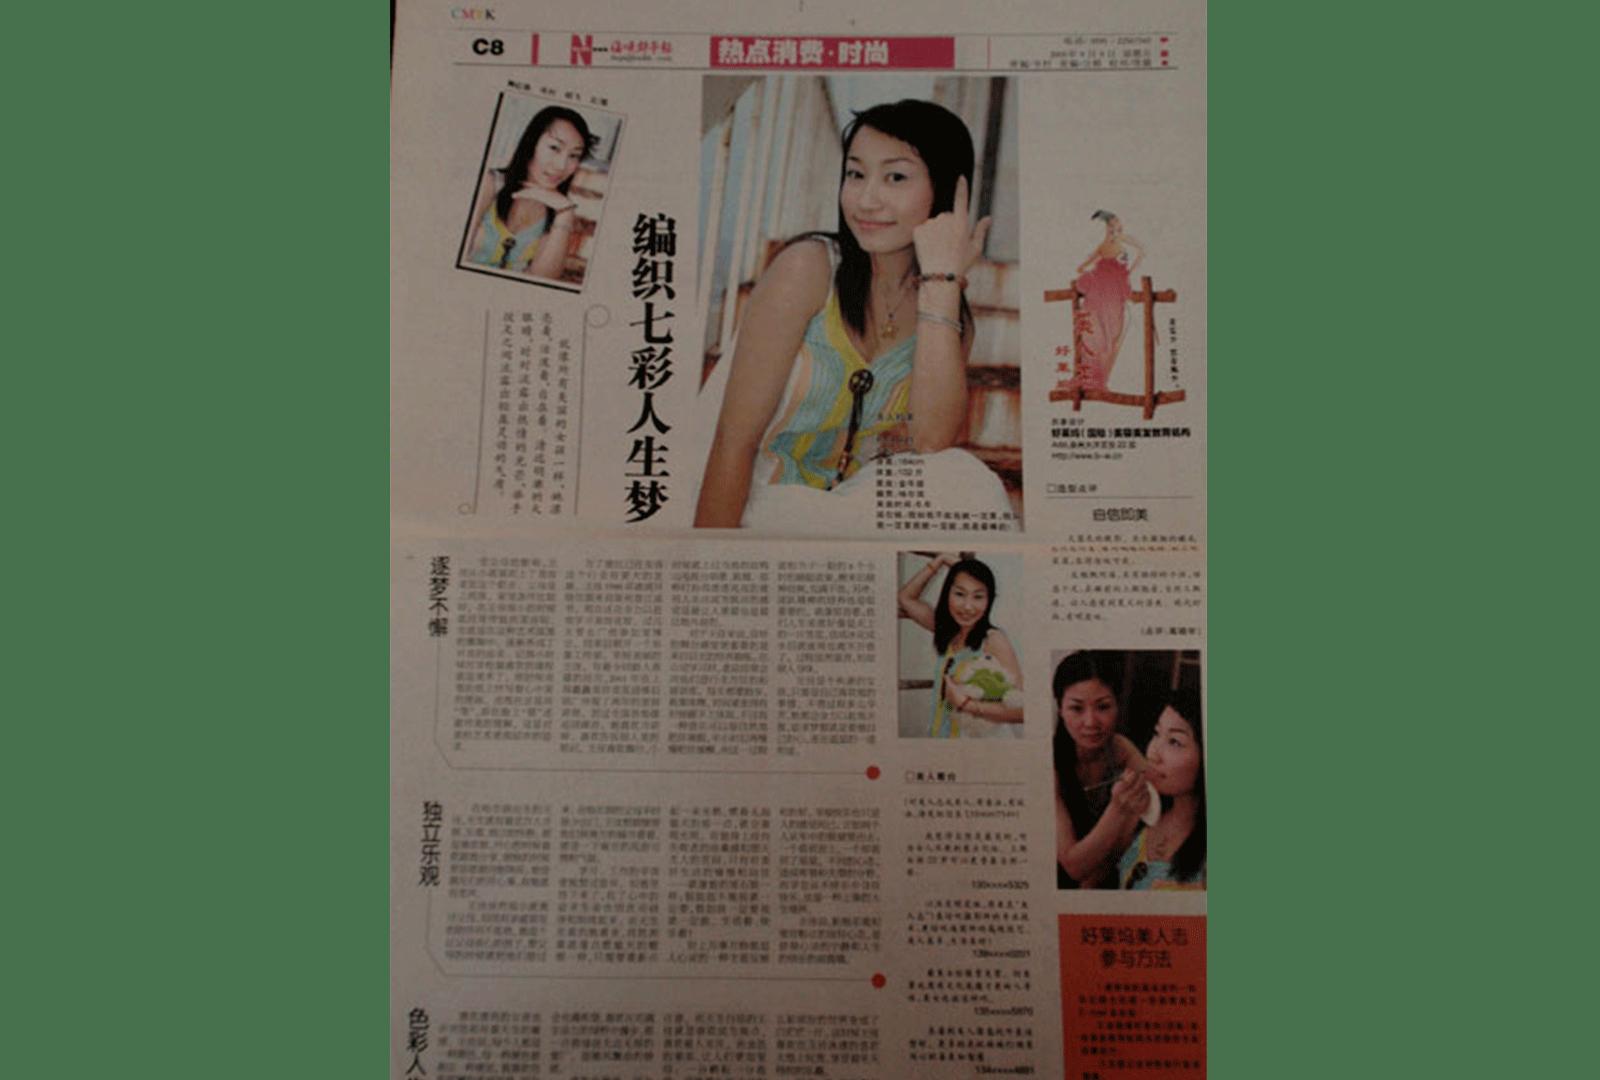 _0000s_0007_海峡都市报-2005-9-9-热点消费·时尚